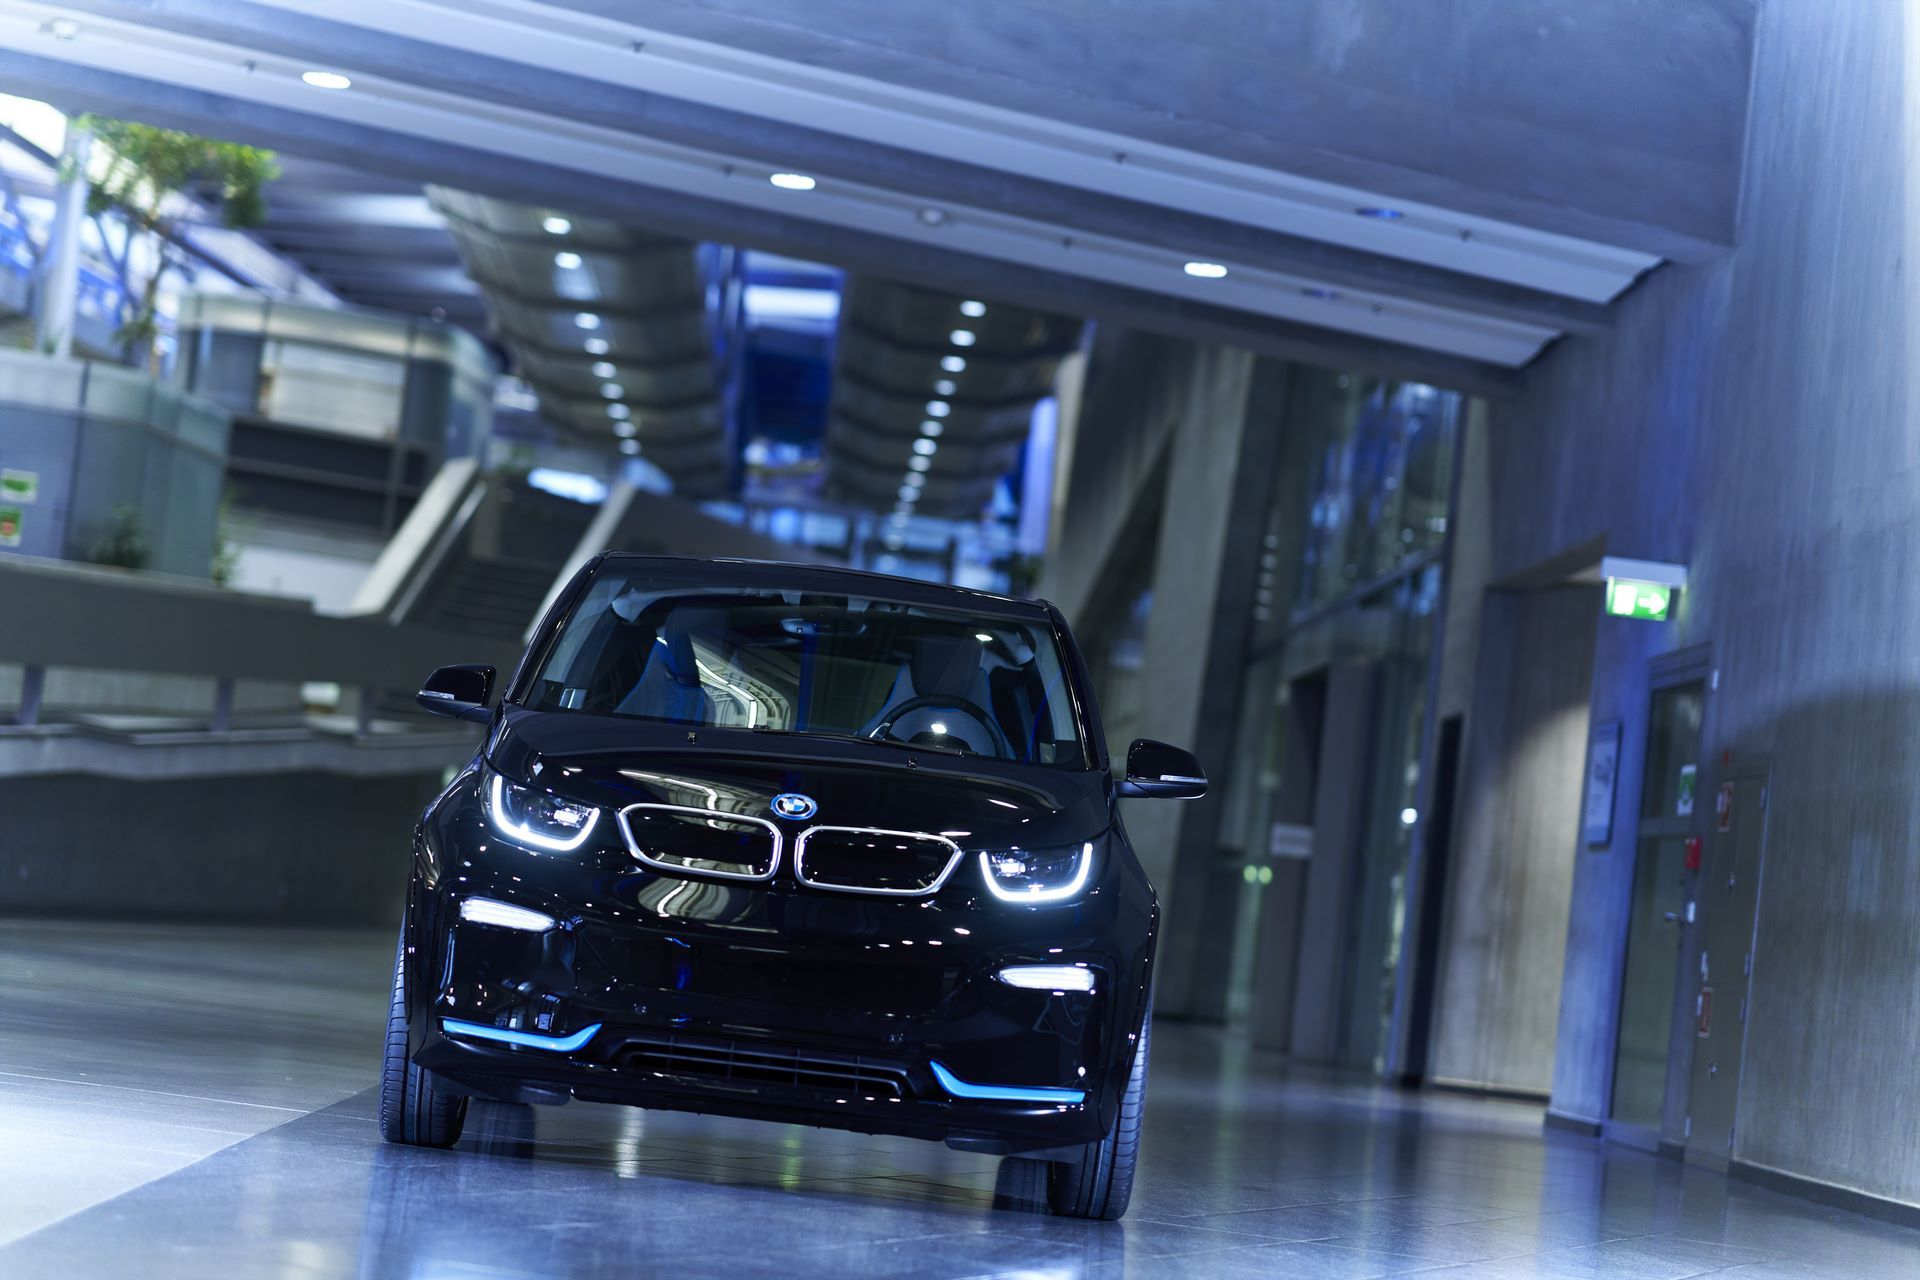 BMW-i8-plant-production-81